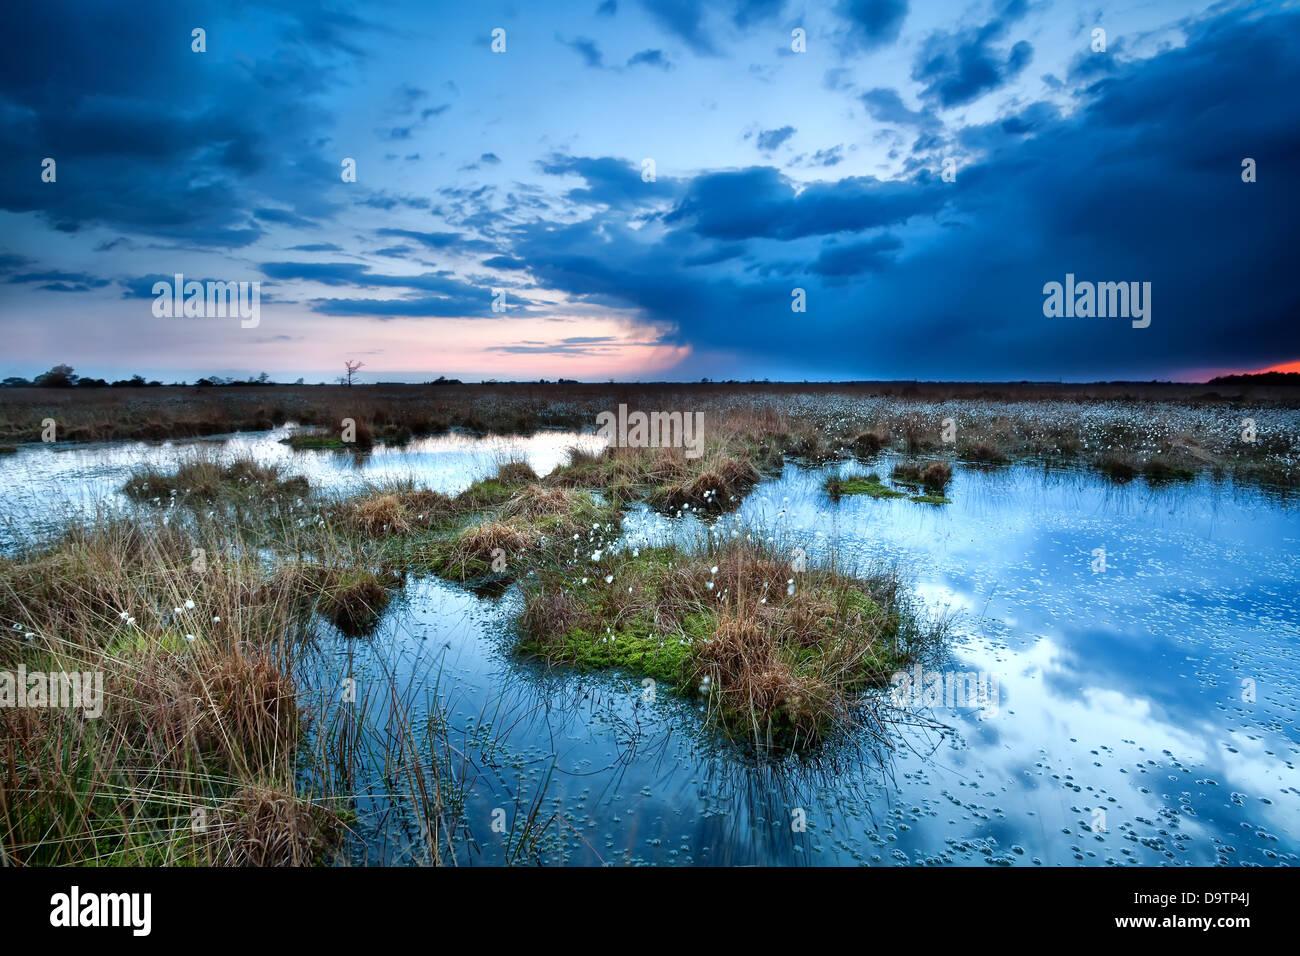 dunkle Gewitterwolken über See bei Sonnenuntergang, Fochteloerveen Stockbild